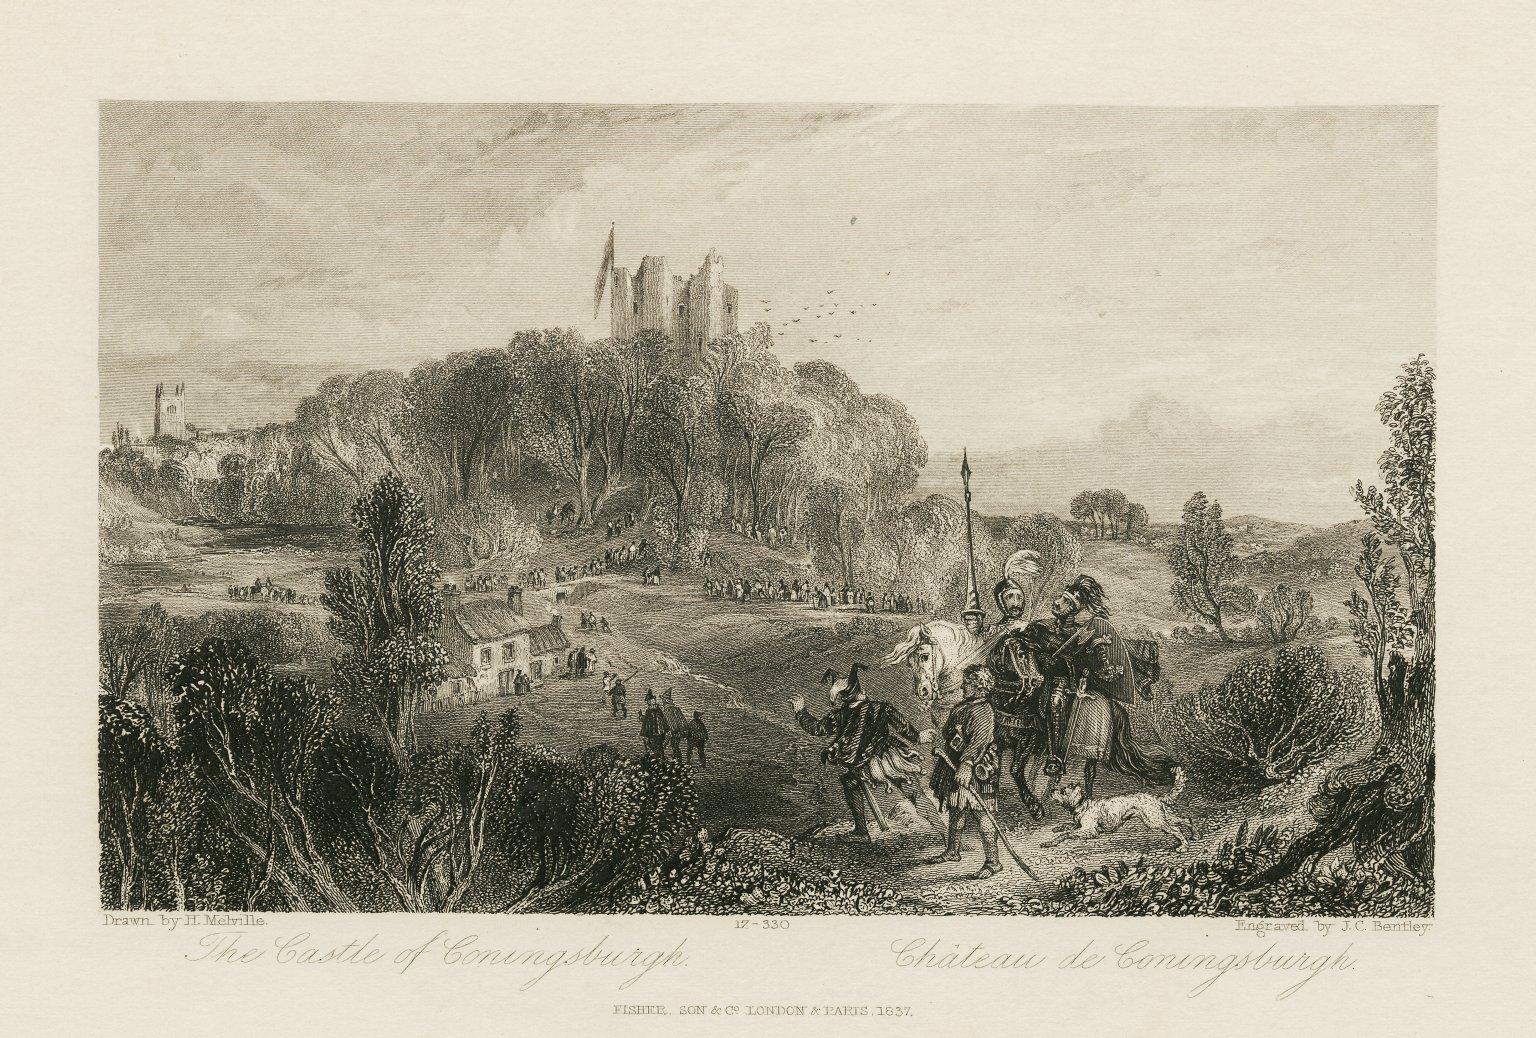 7. Castle of Coningsburgh